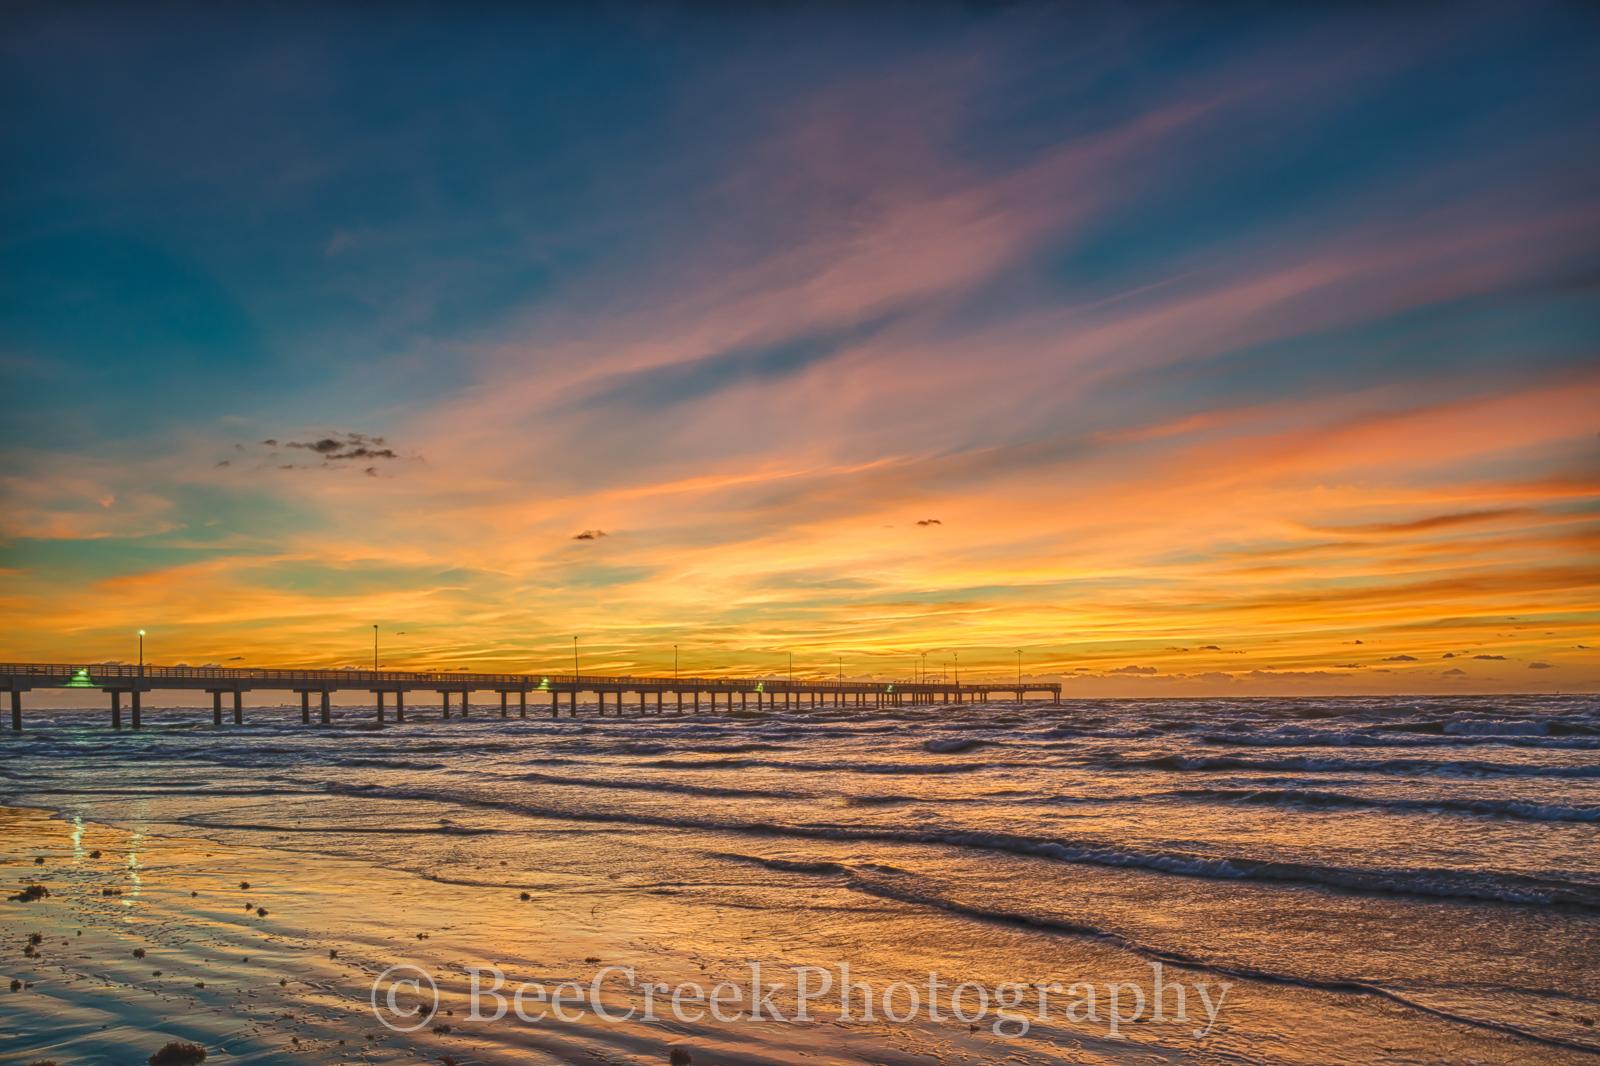 Caldwell fishing pier, Port A, Port Aransas, Sunrise, Texas Coast, Texas beach, beach, coast, colorful skies, fiery red sky, landscape, landscapes, ocean, sand, sea weed, seascape, shore, surf, texas , photo